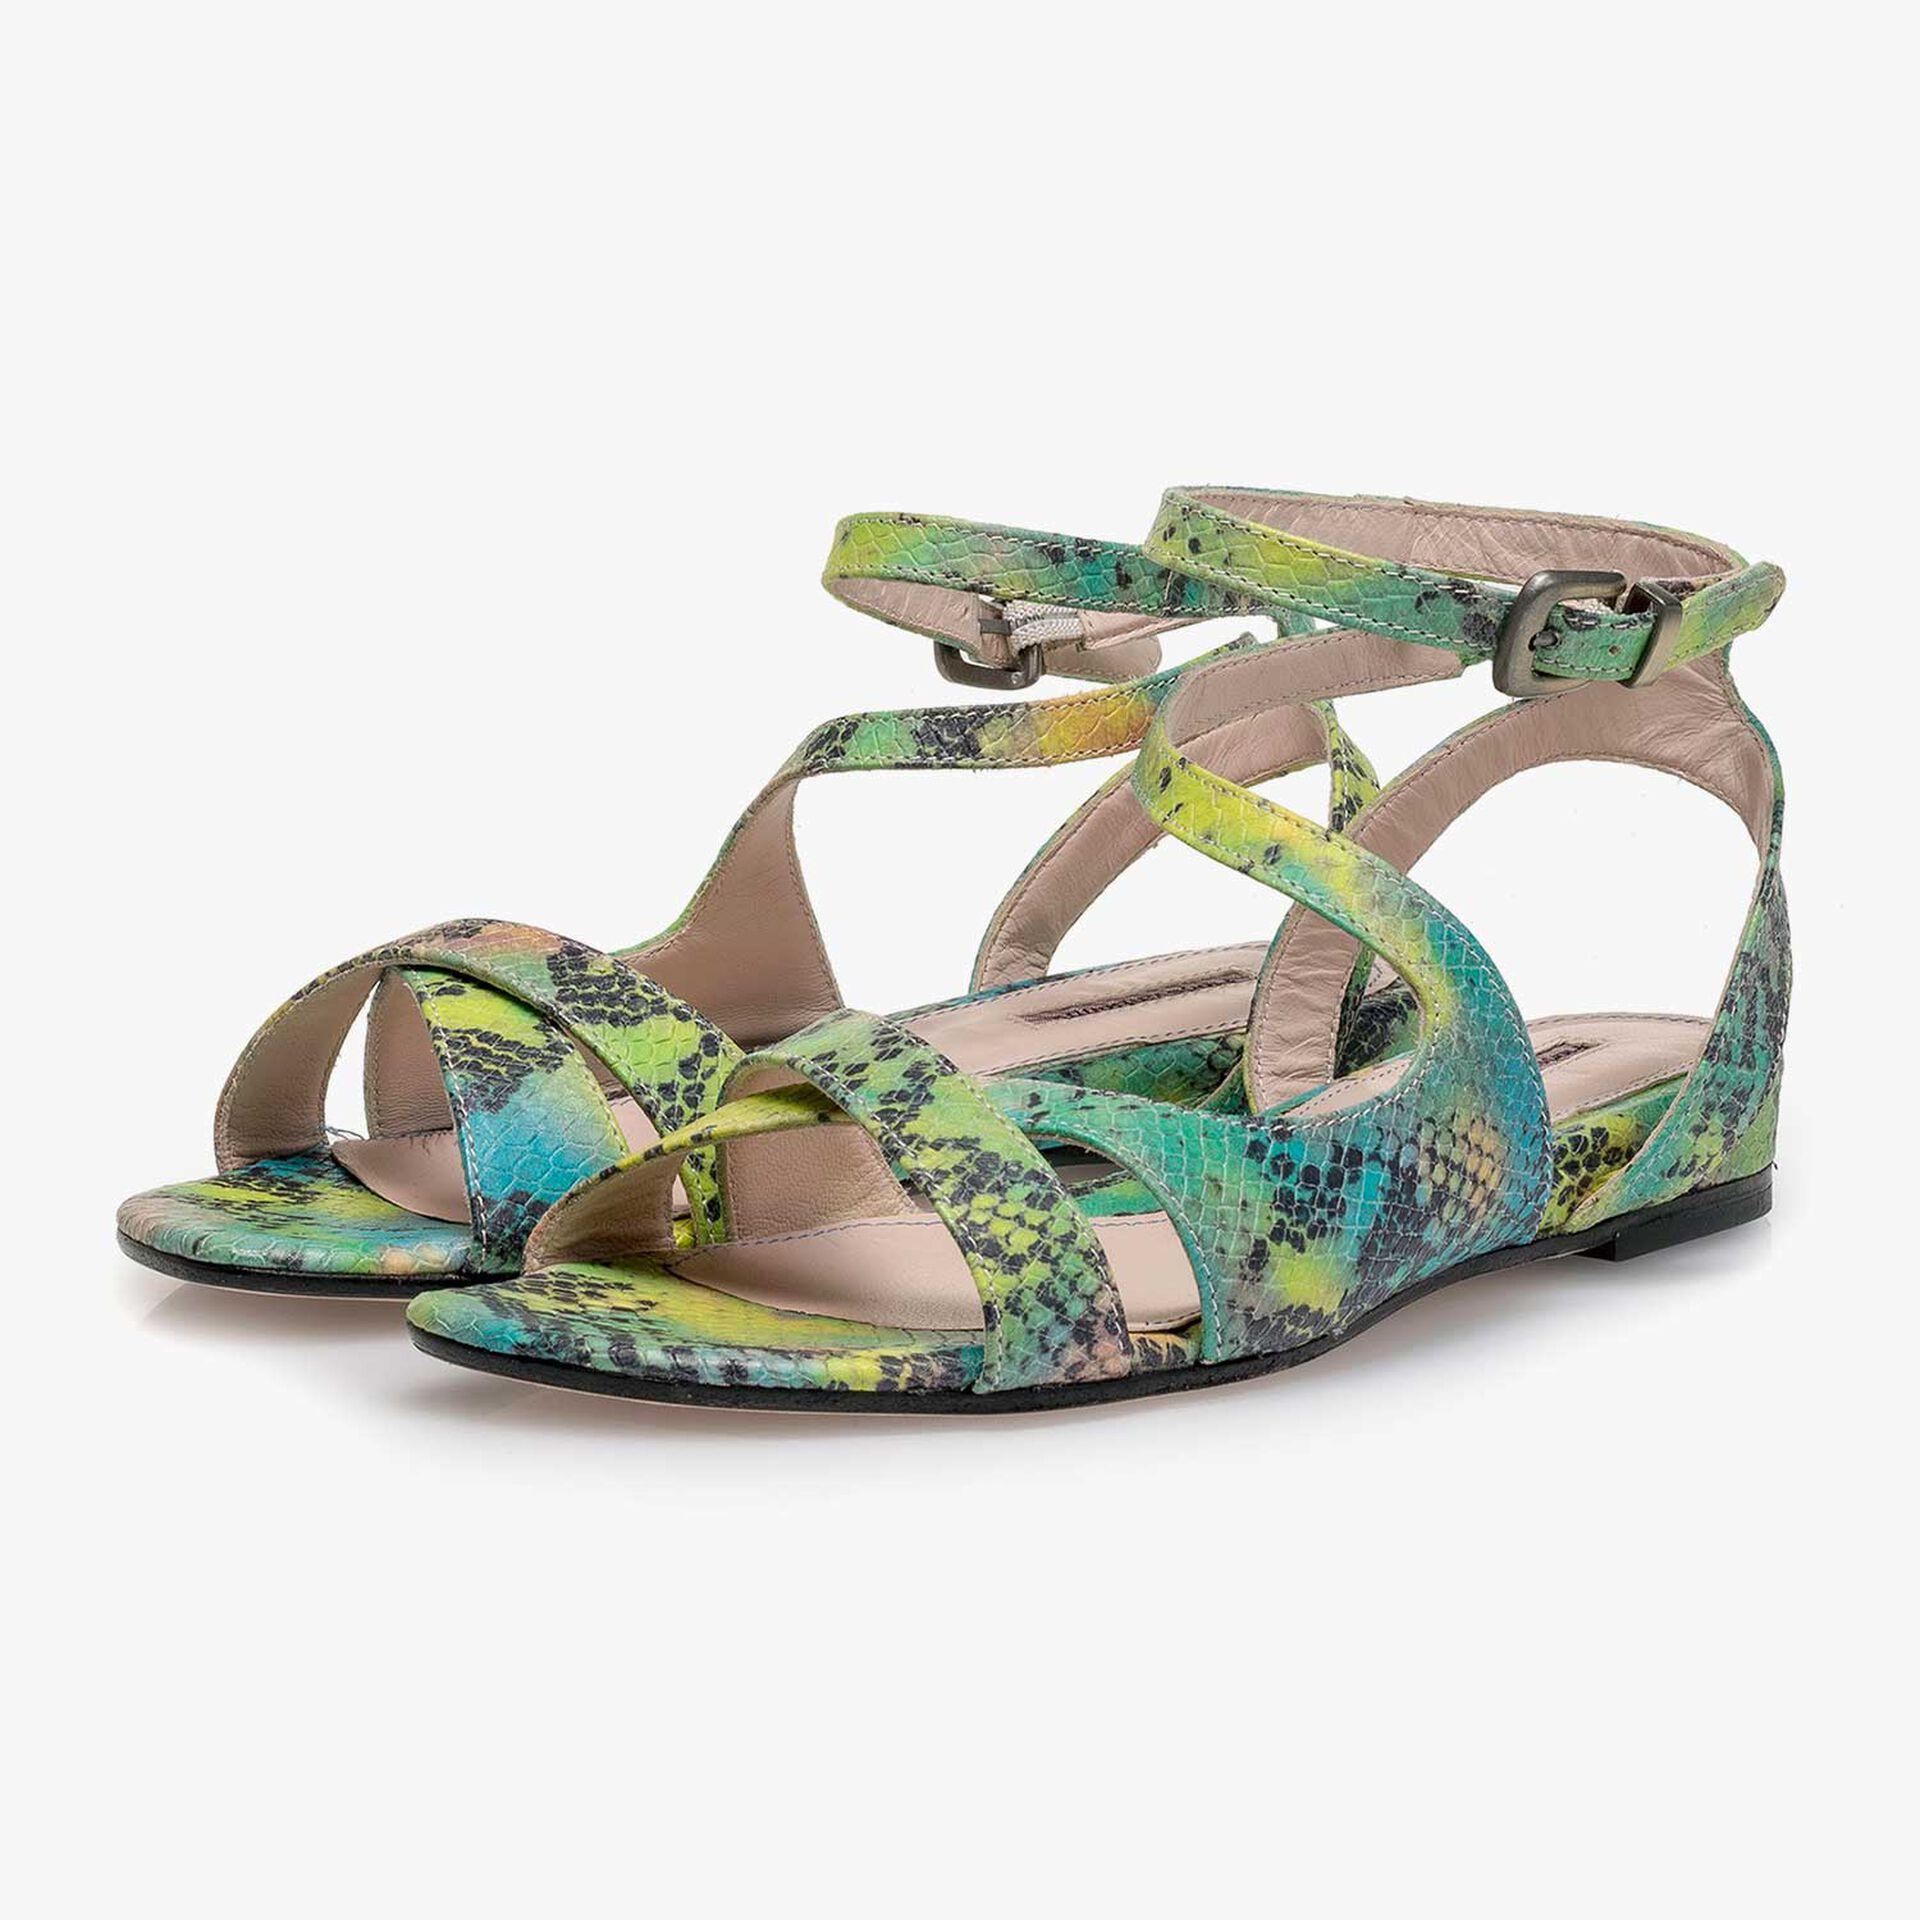 Green snake print leather sandal